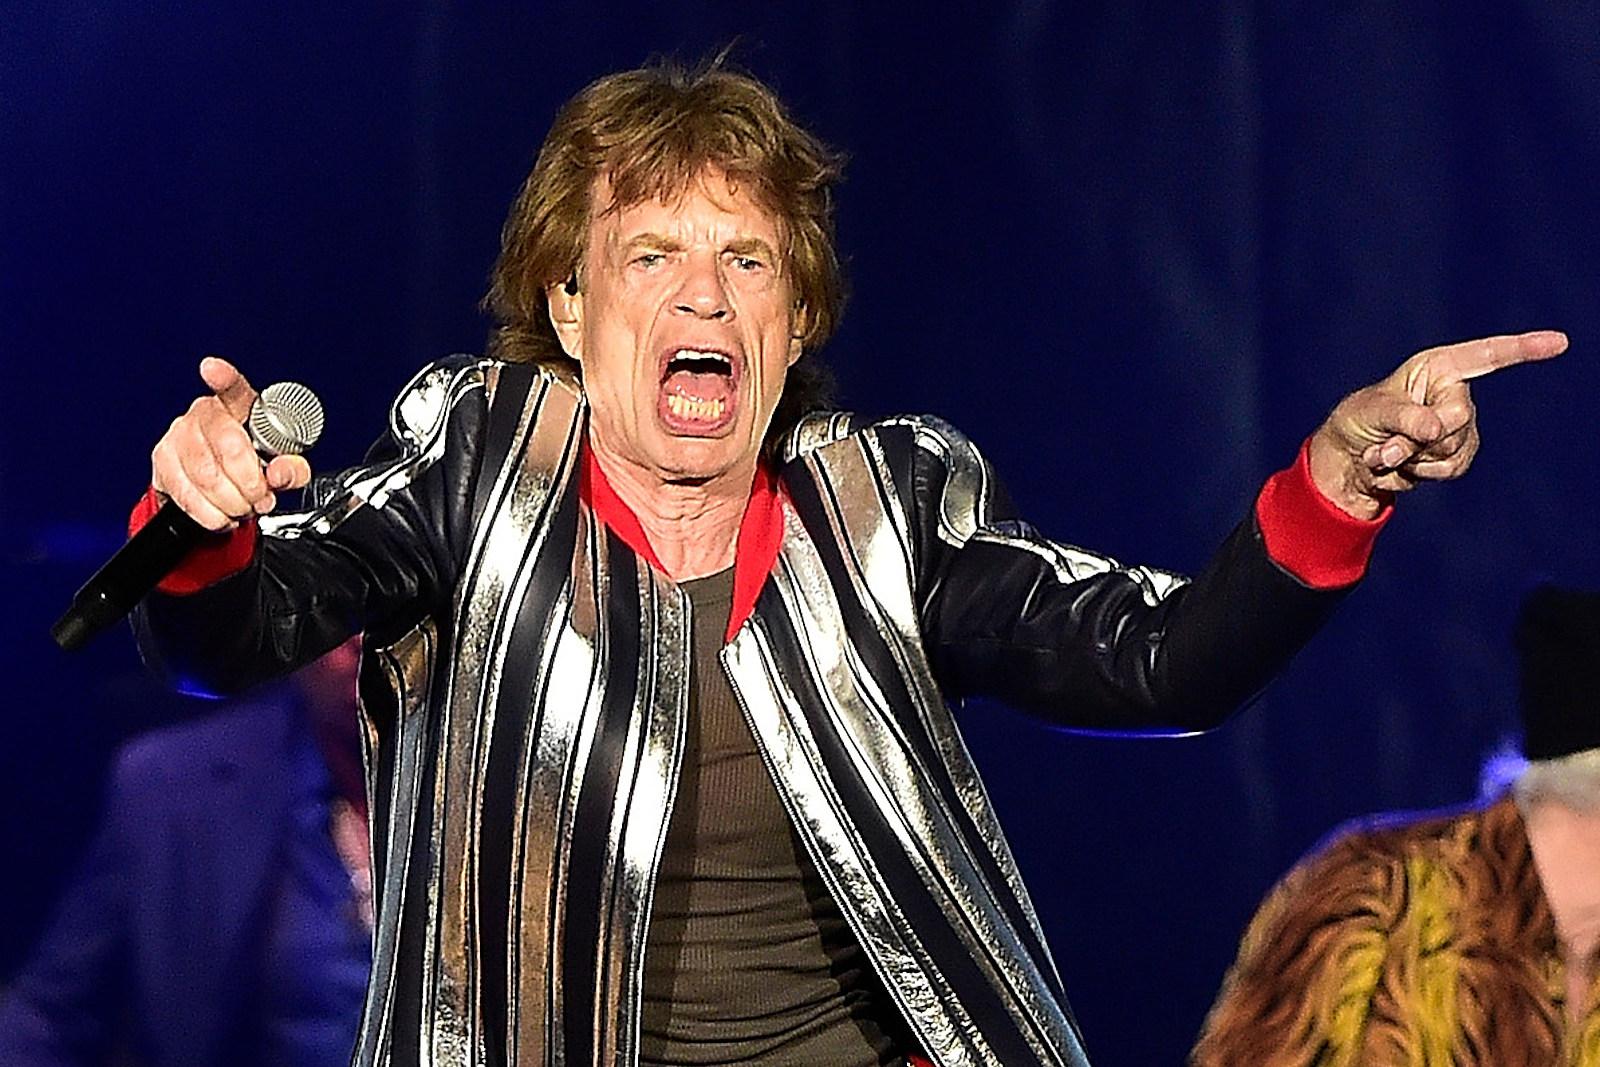 Mick Jagger 'Went Unnoticed' at a North Carolina Dive Bar